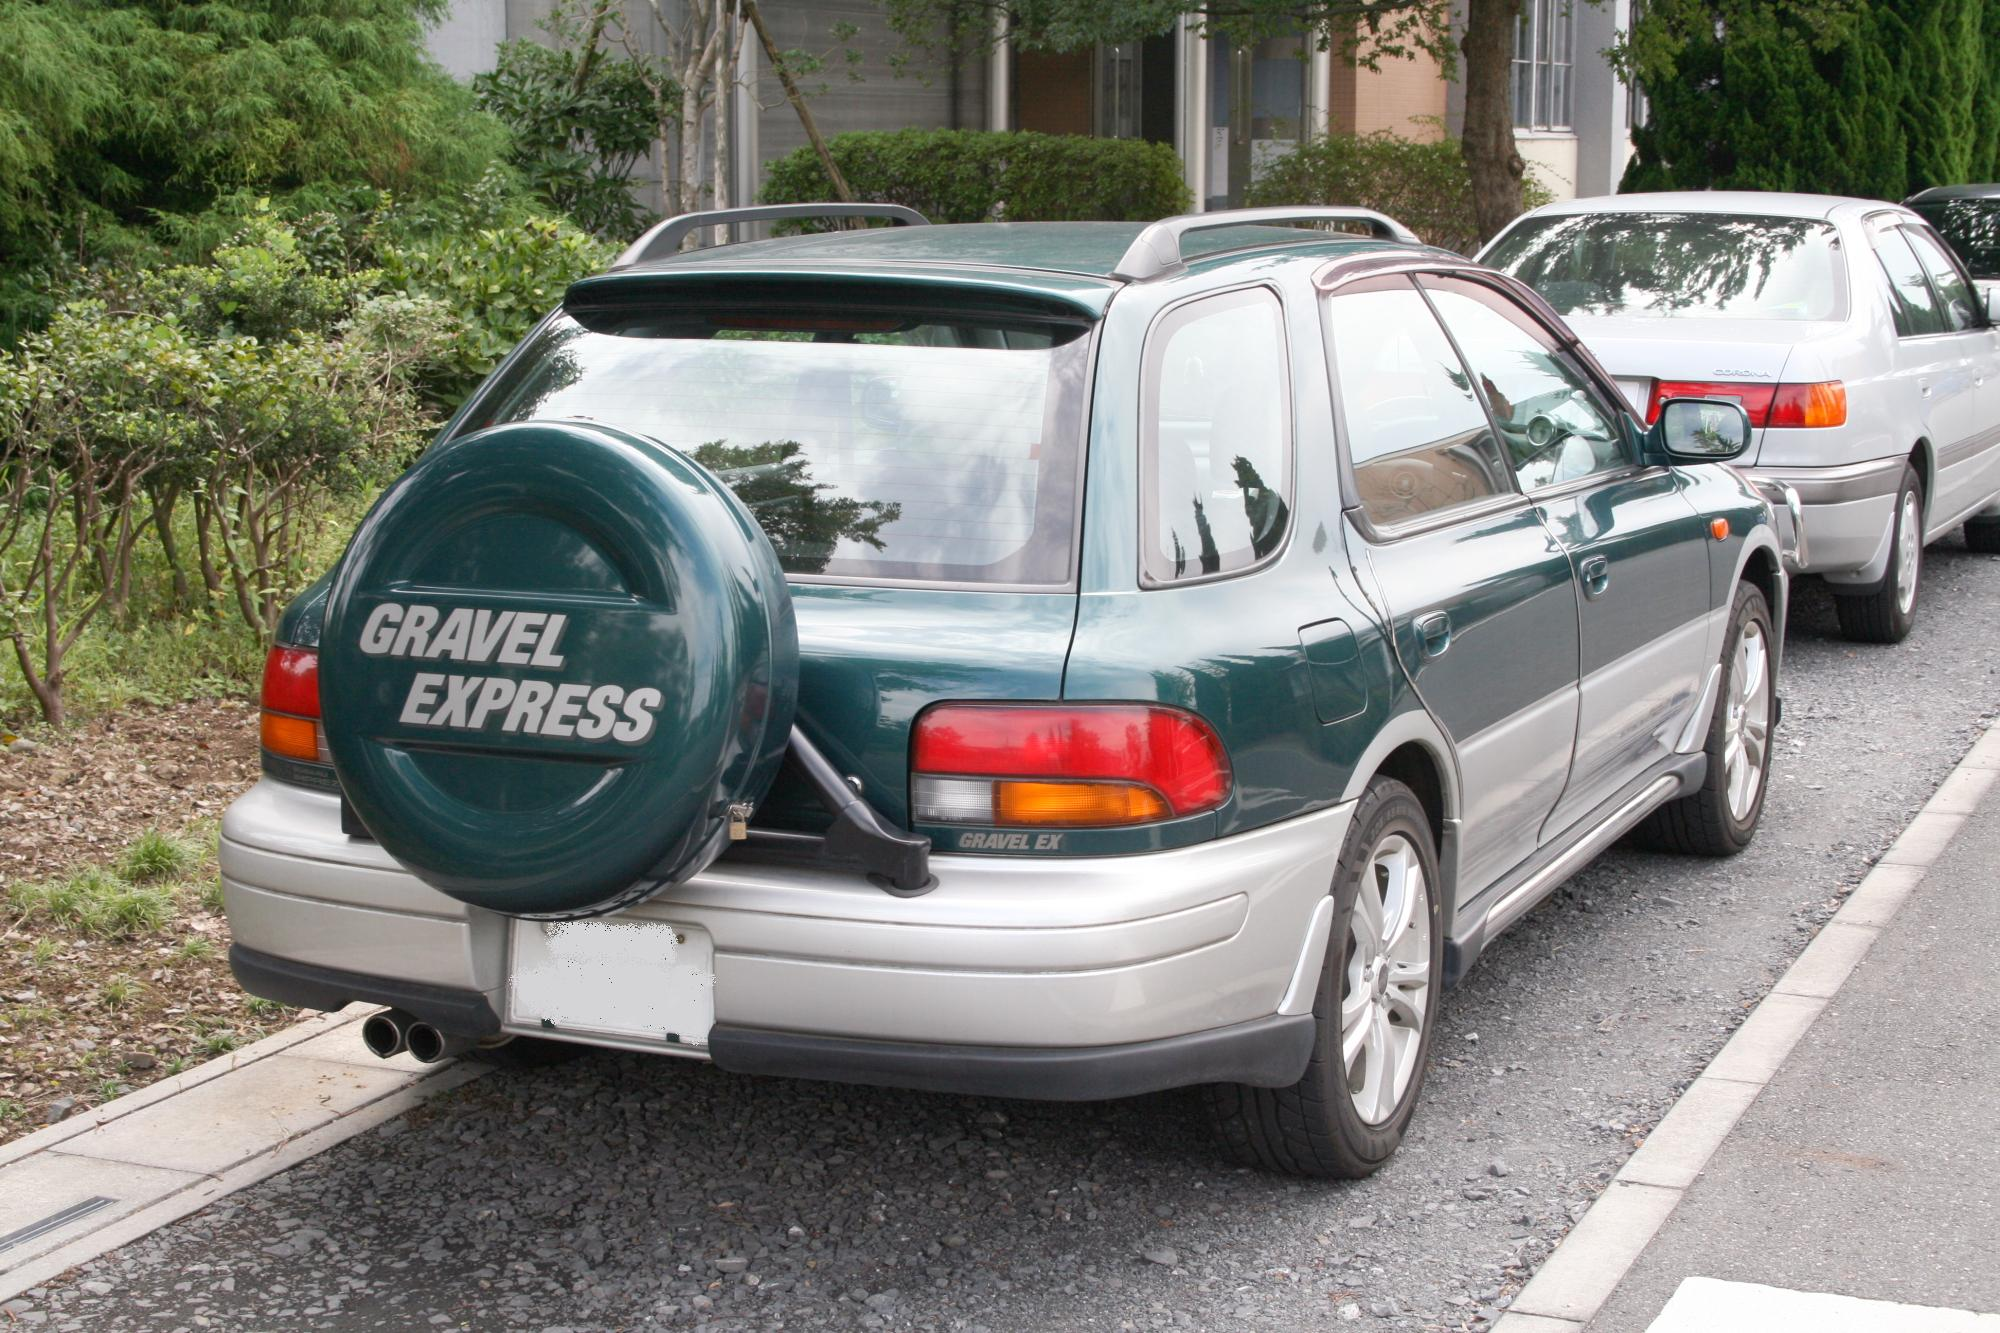 File Image Subaru Impreza Gravel Express No2 Jpg